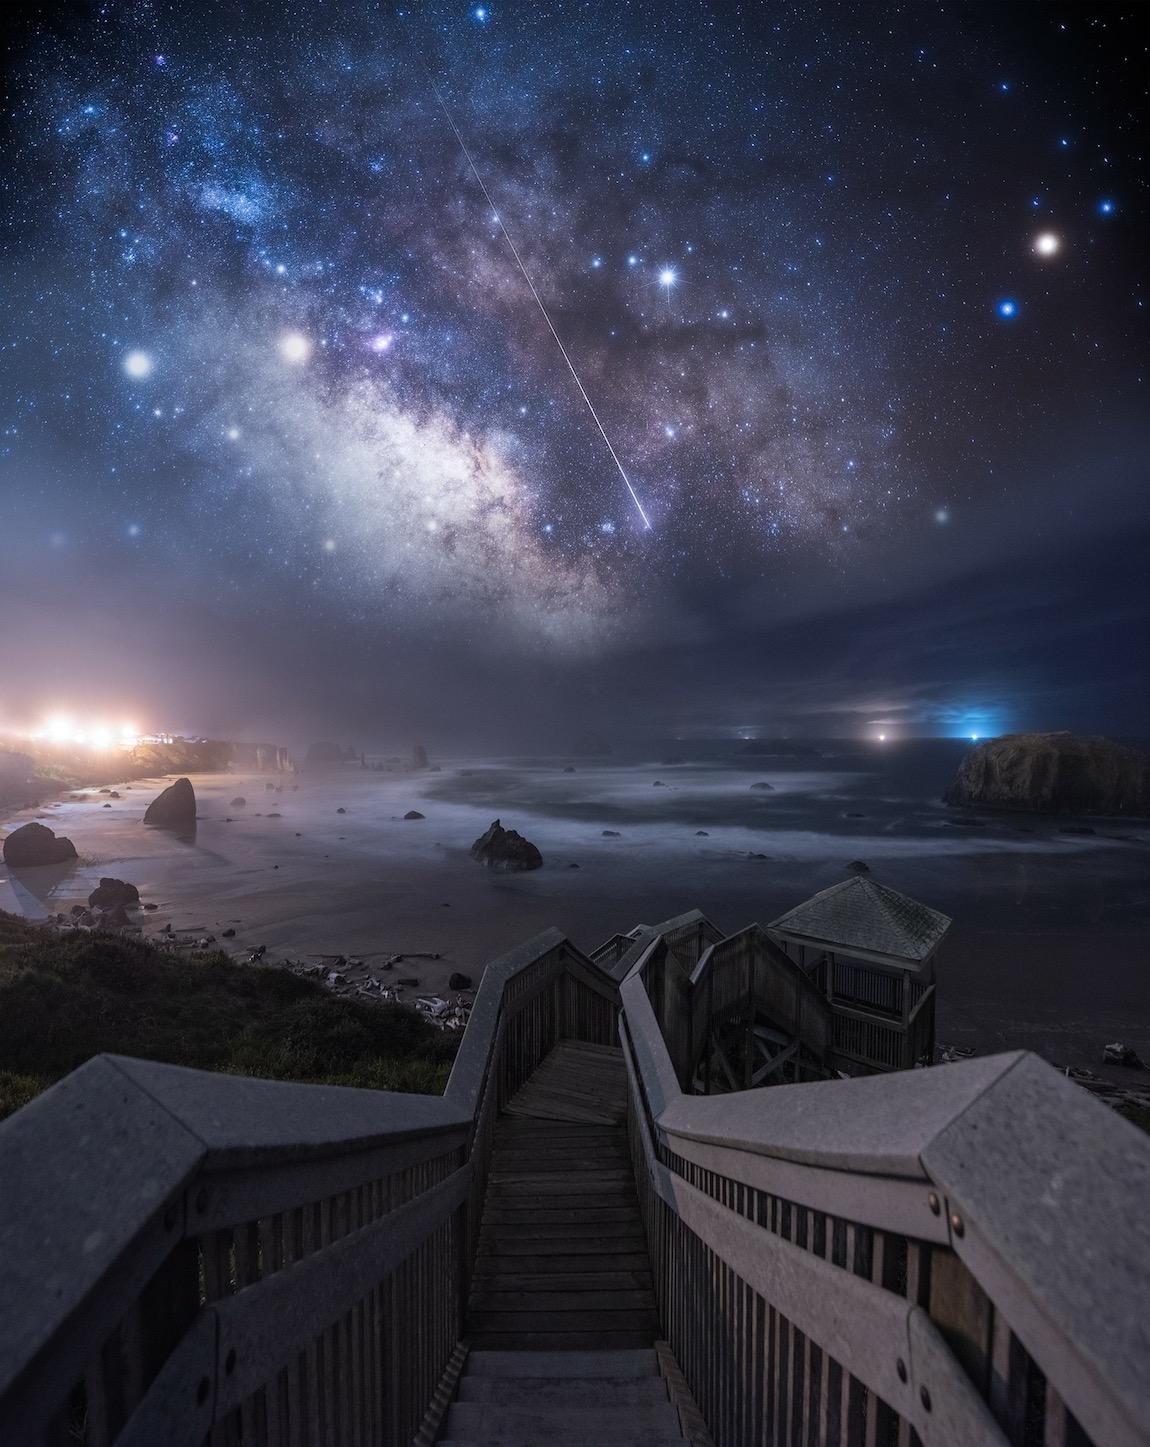 night-landscape-photography-11